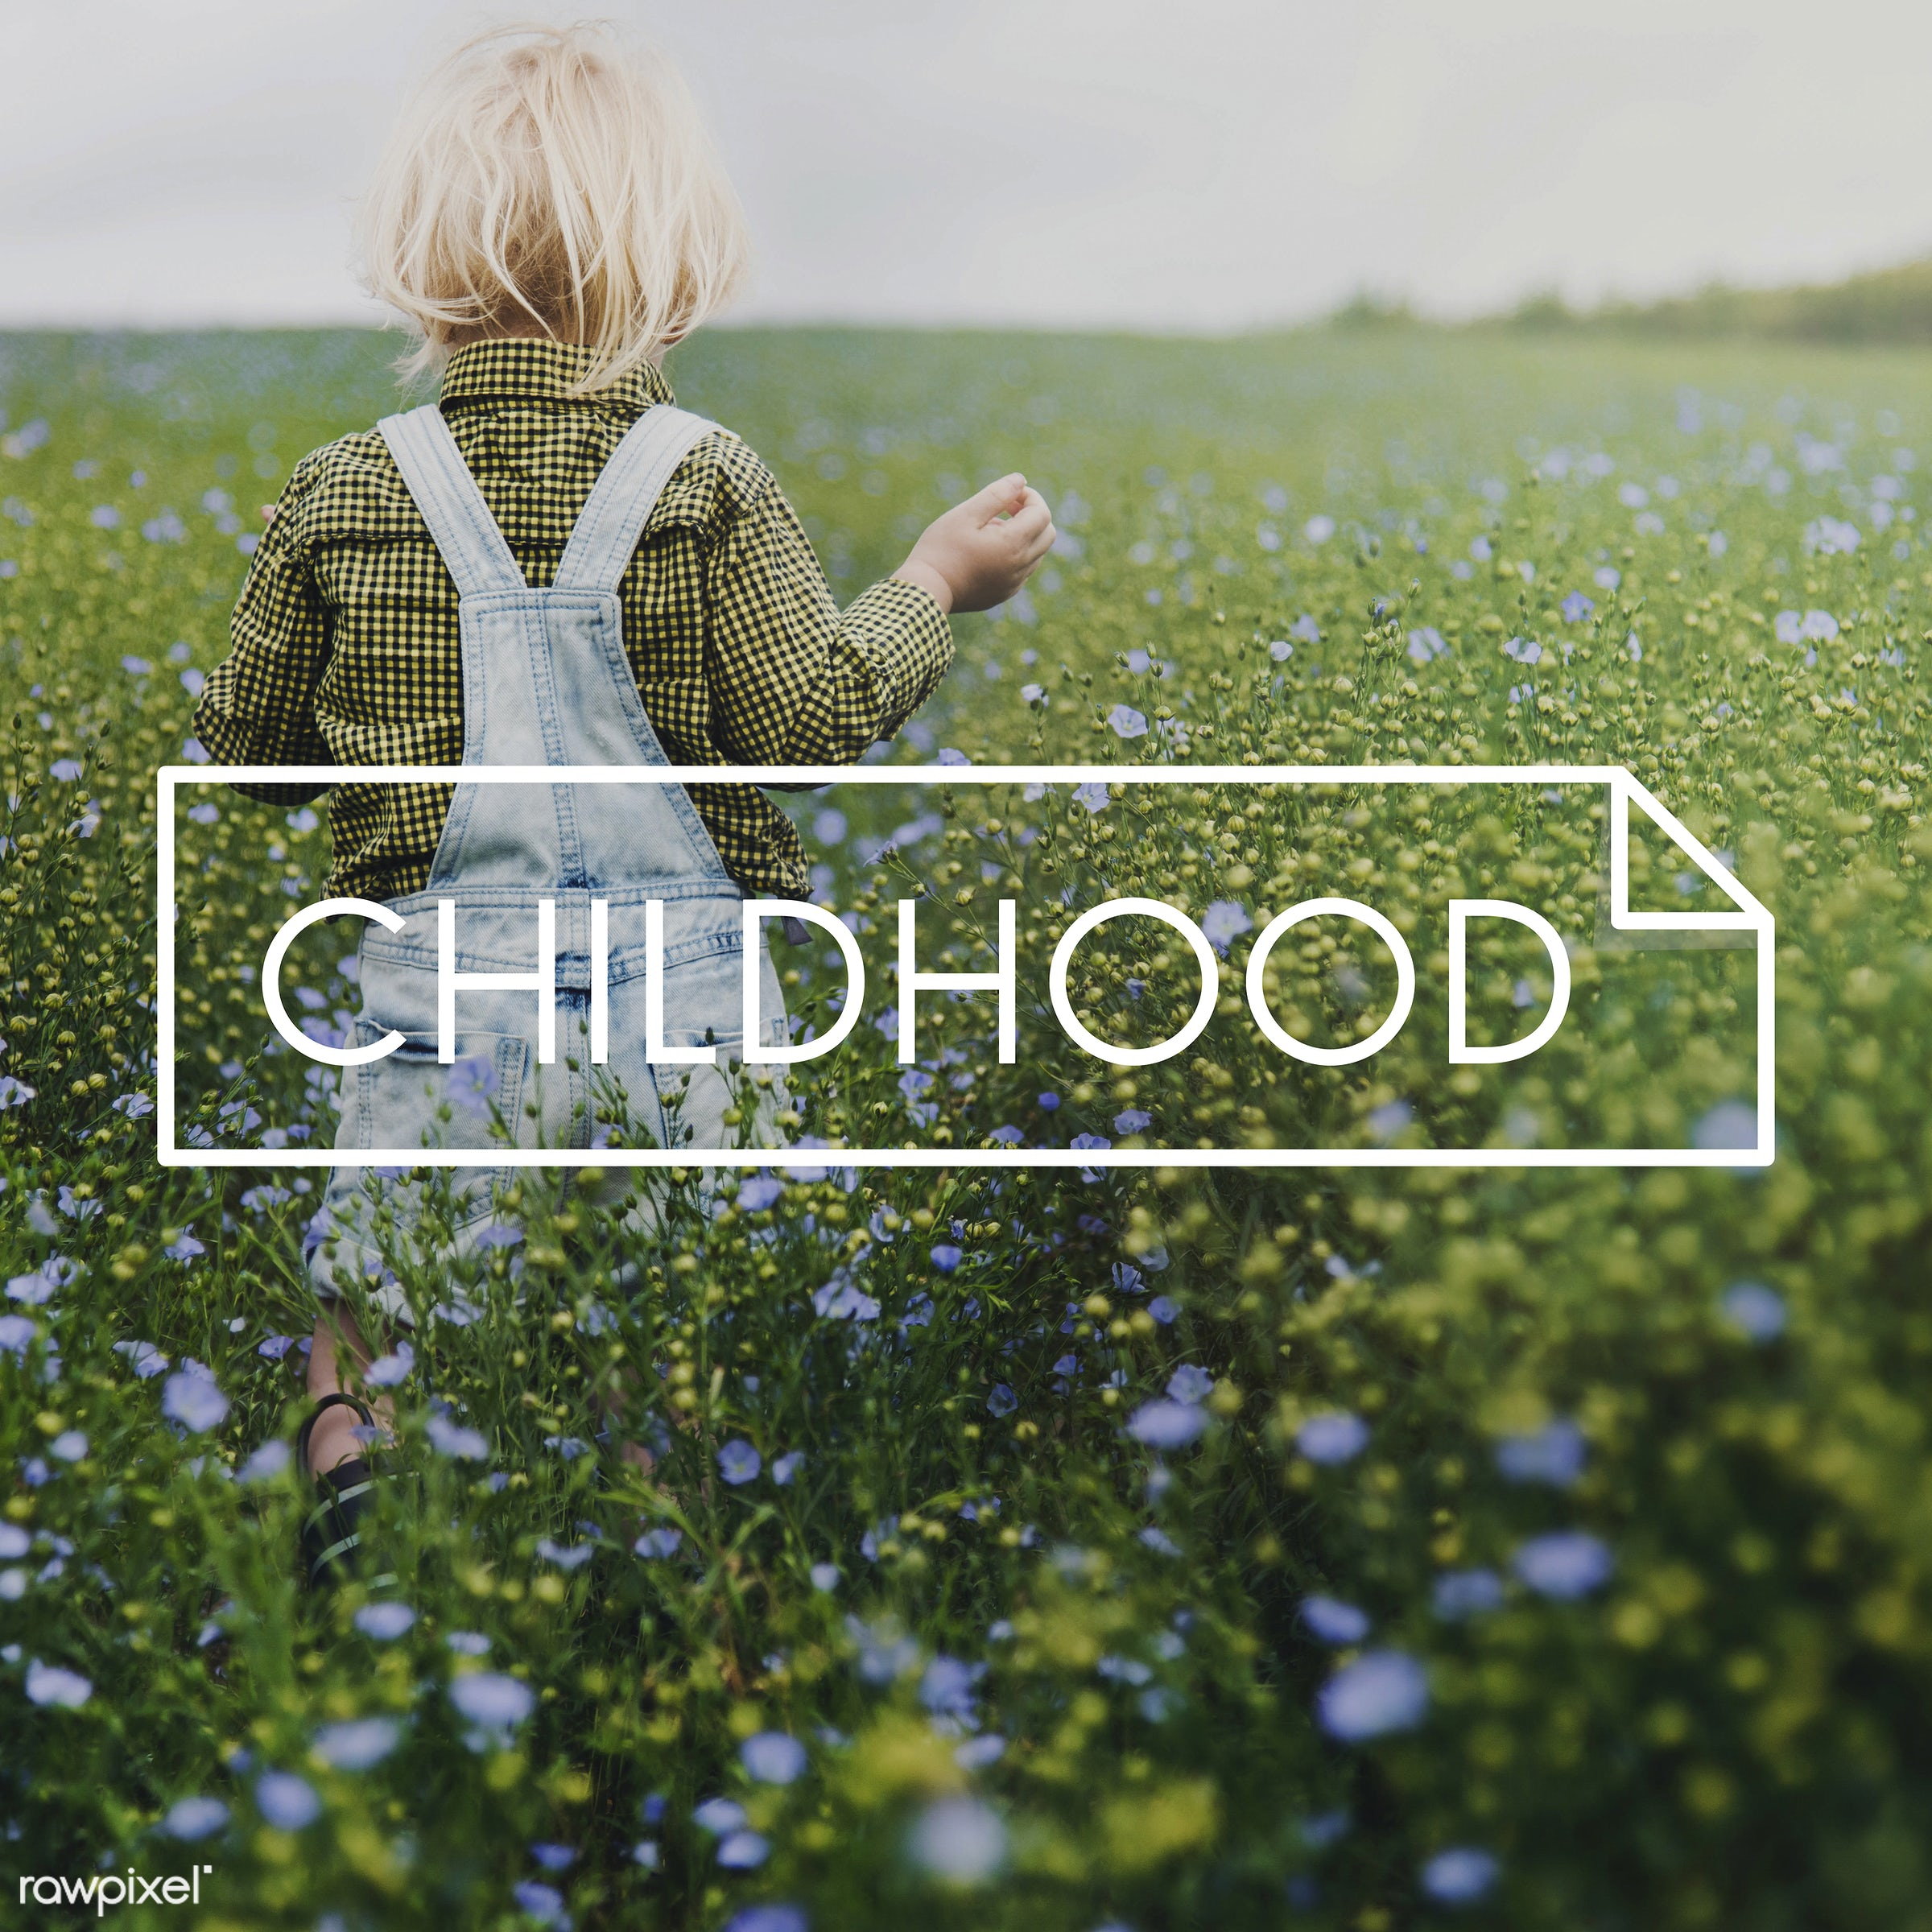 adorable, badge, banner, blonde, boy, caucasian, childhood, dungarees, enjoyment, environment, flower garden, flowers, fresh...